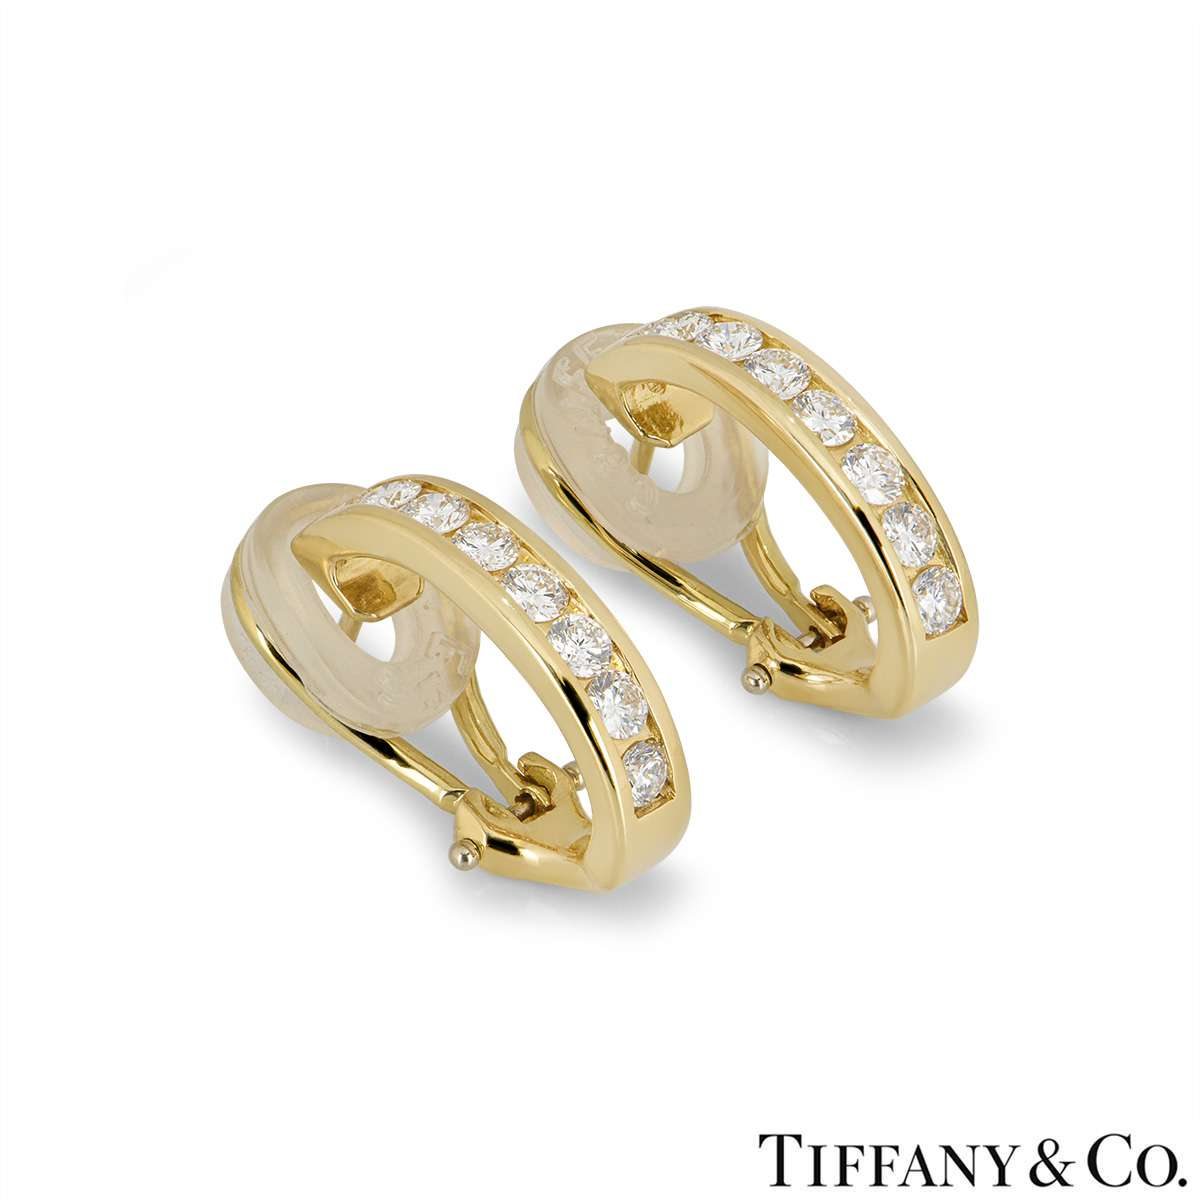 cd4b6bb6e Tiffany & Co 18k Yellow Gold Diamond Set Hoop Earrings 0.96ct ...